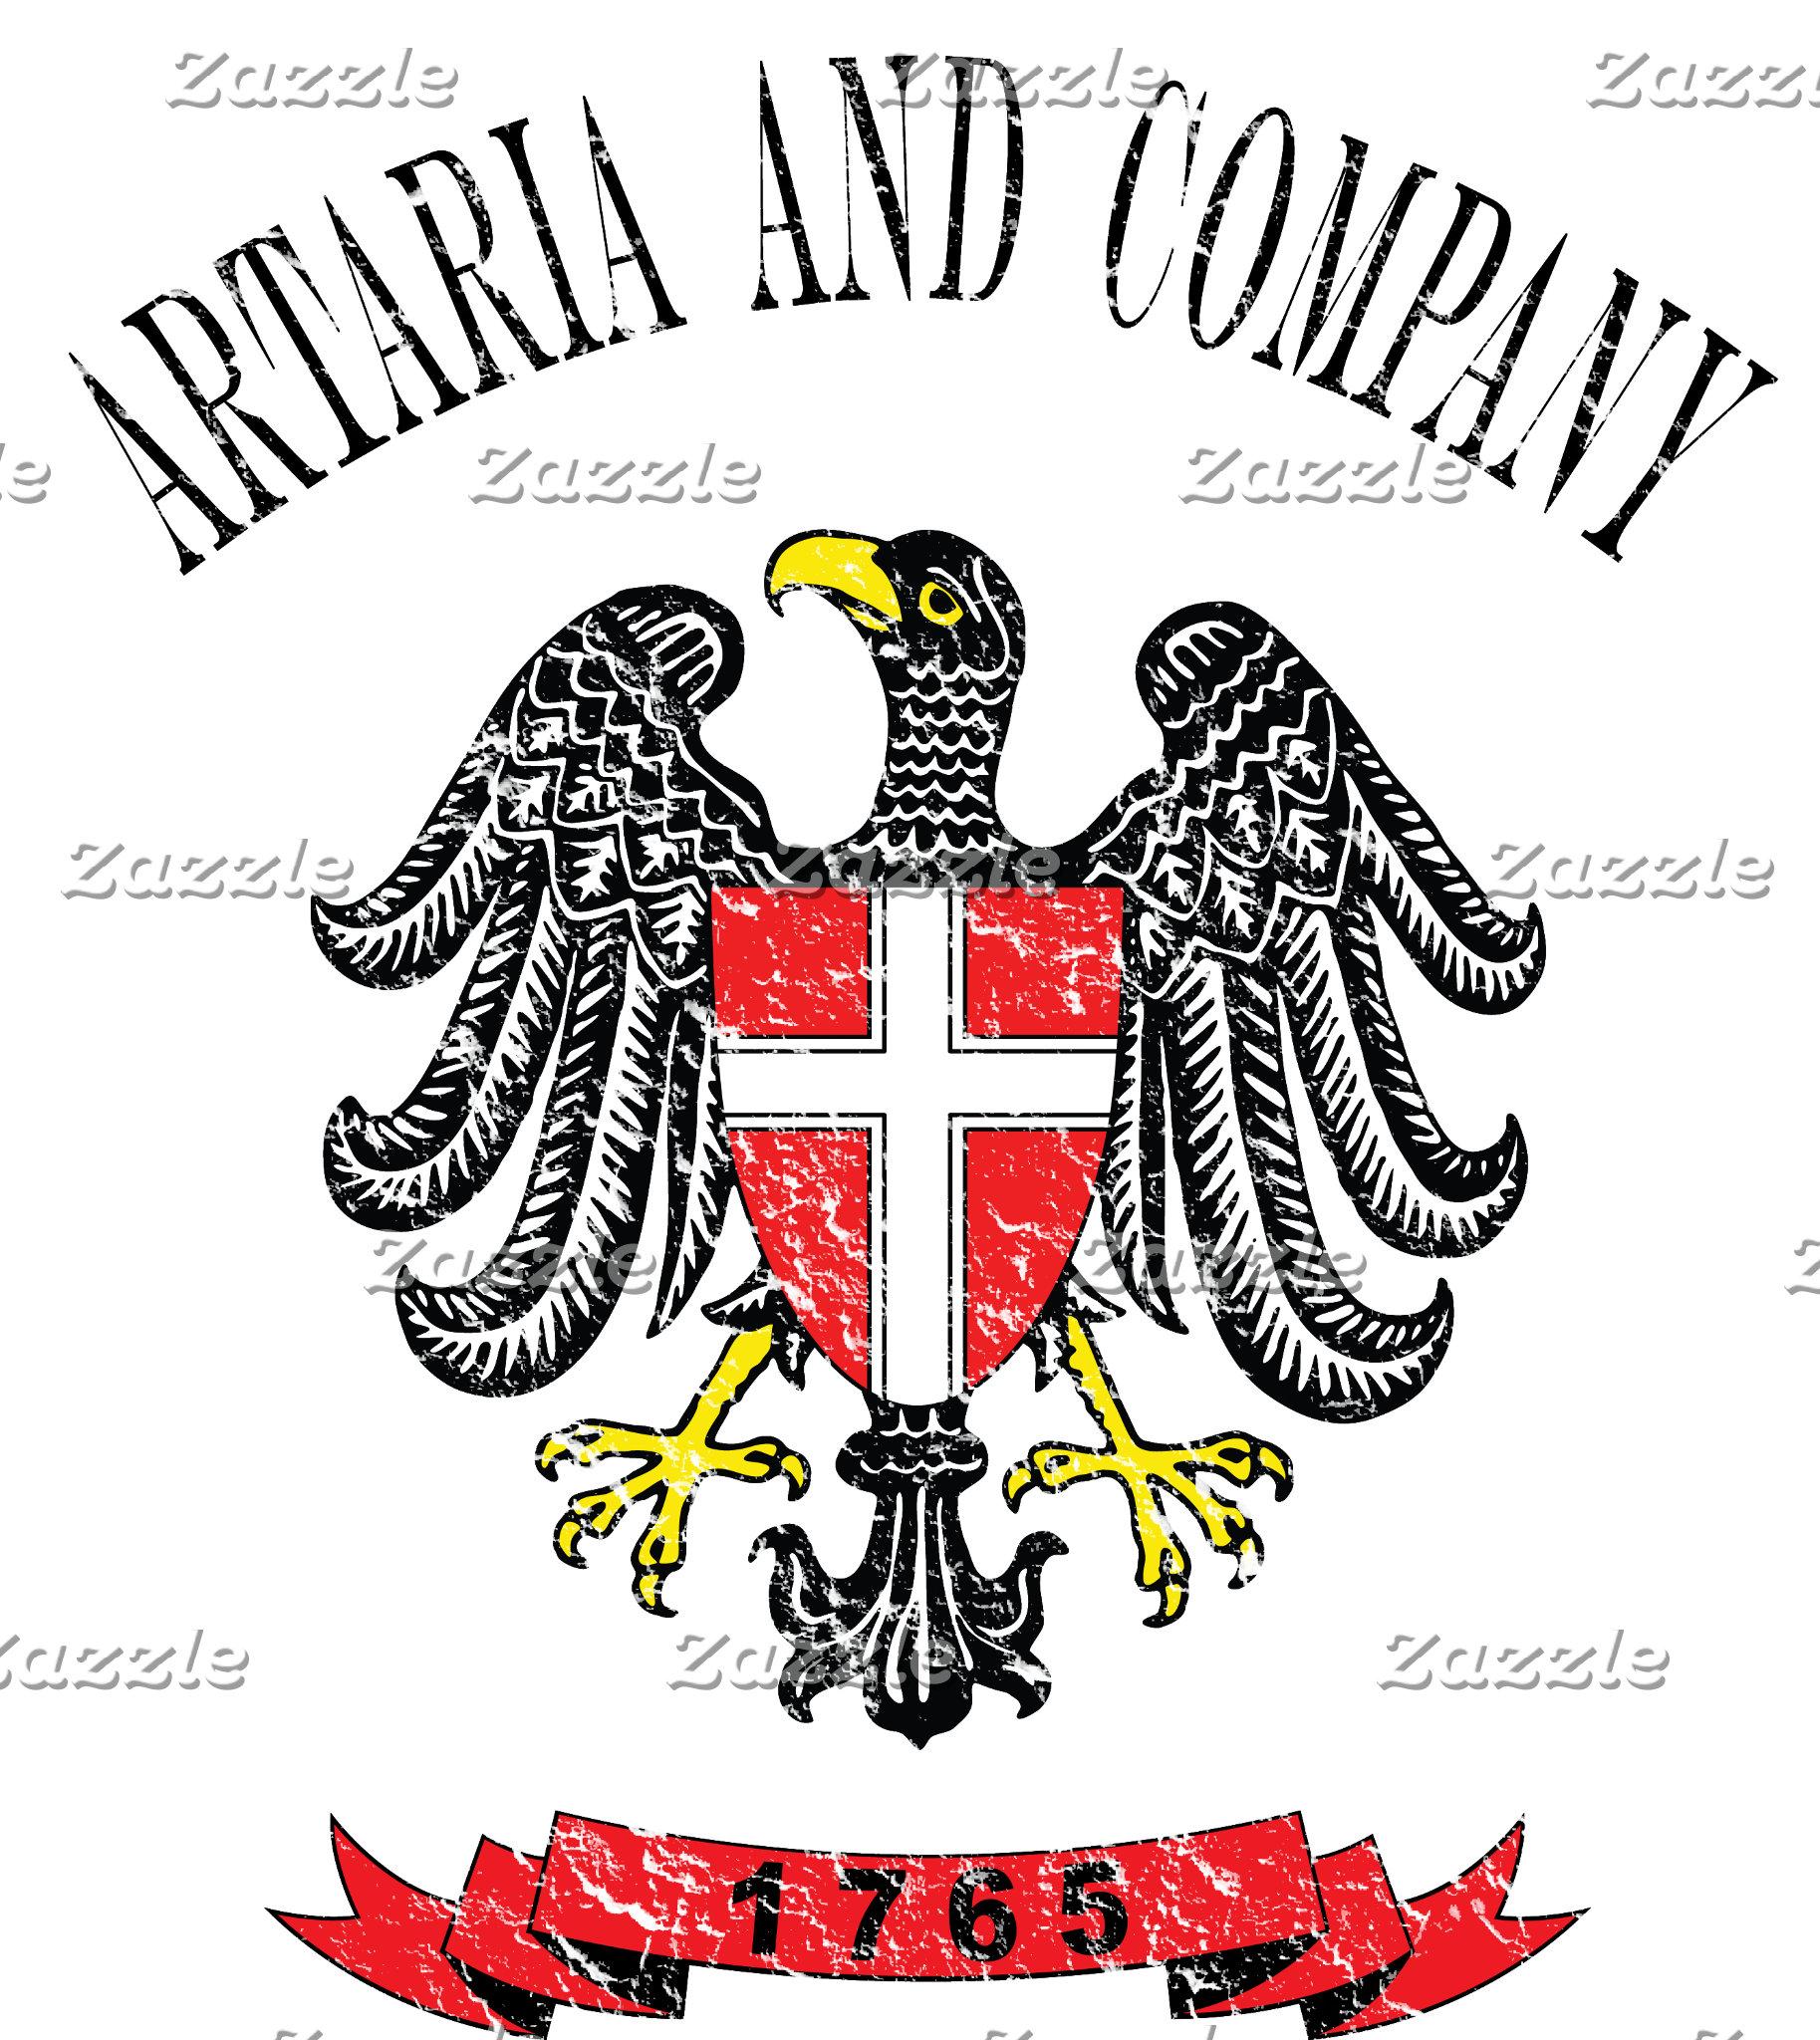 Artaria and Company